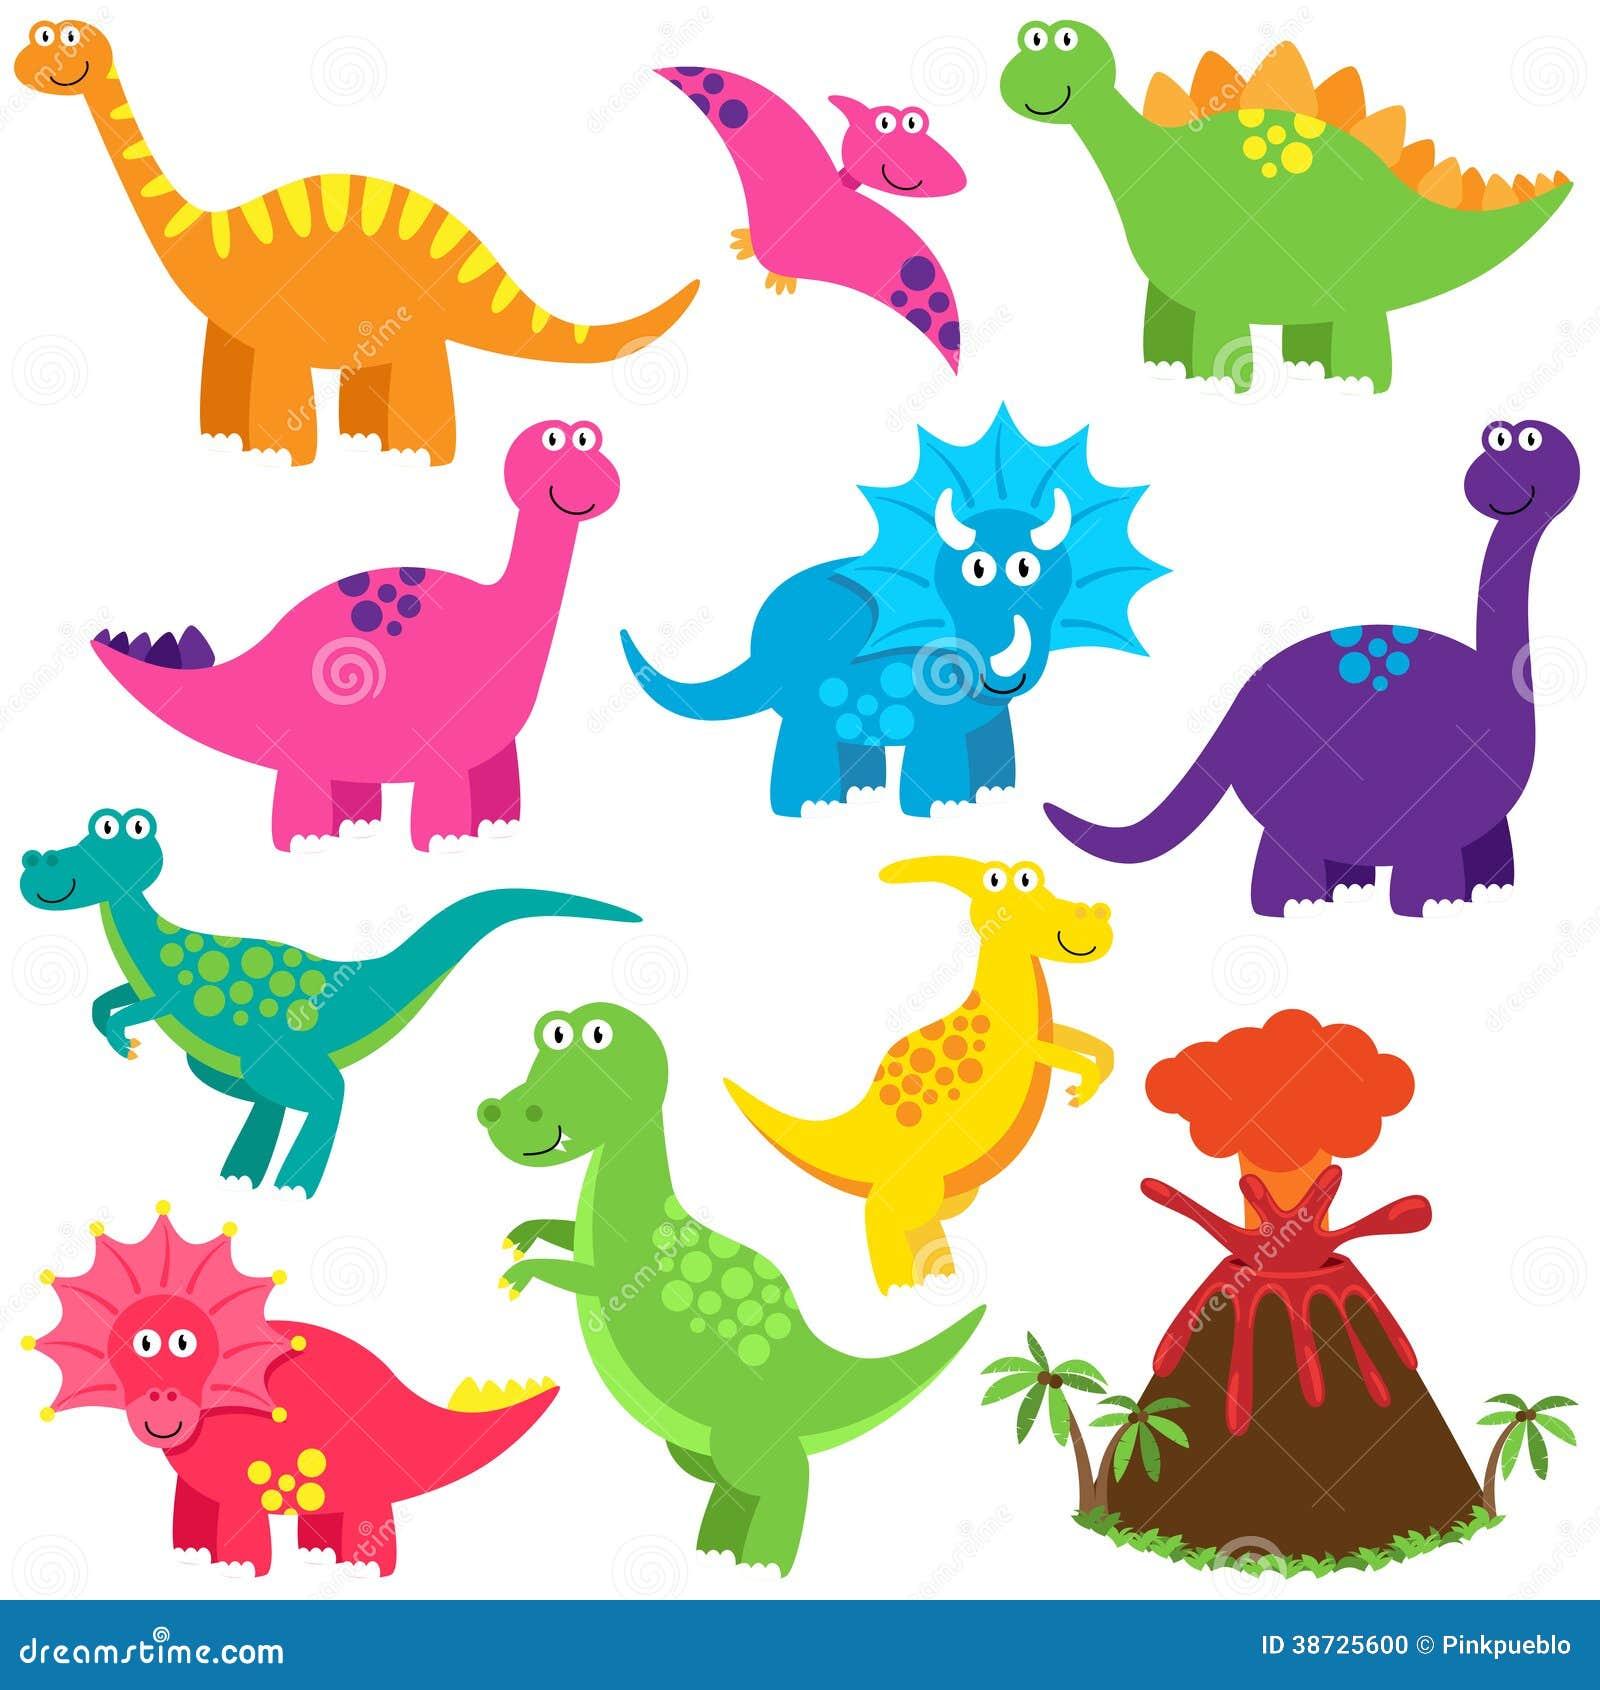 Vector Collection of Cute Cartoon Dinosaurs